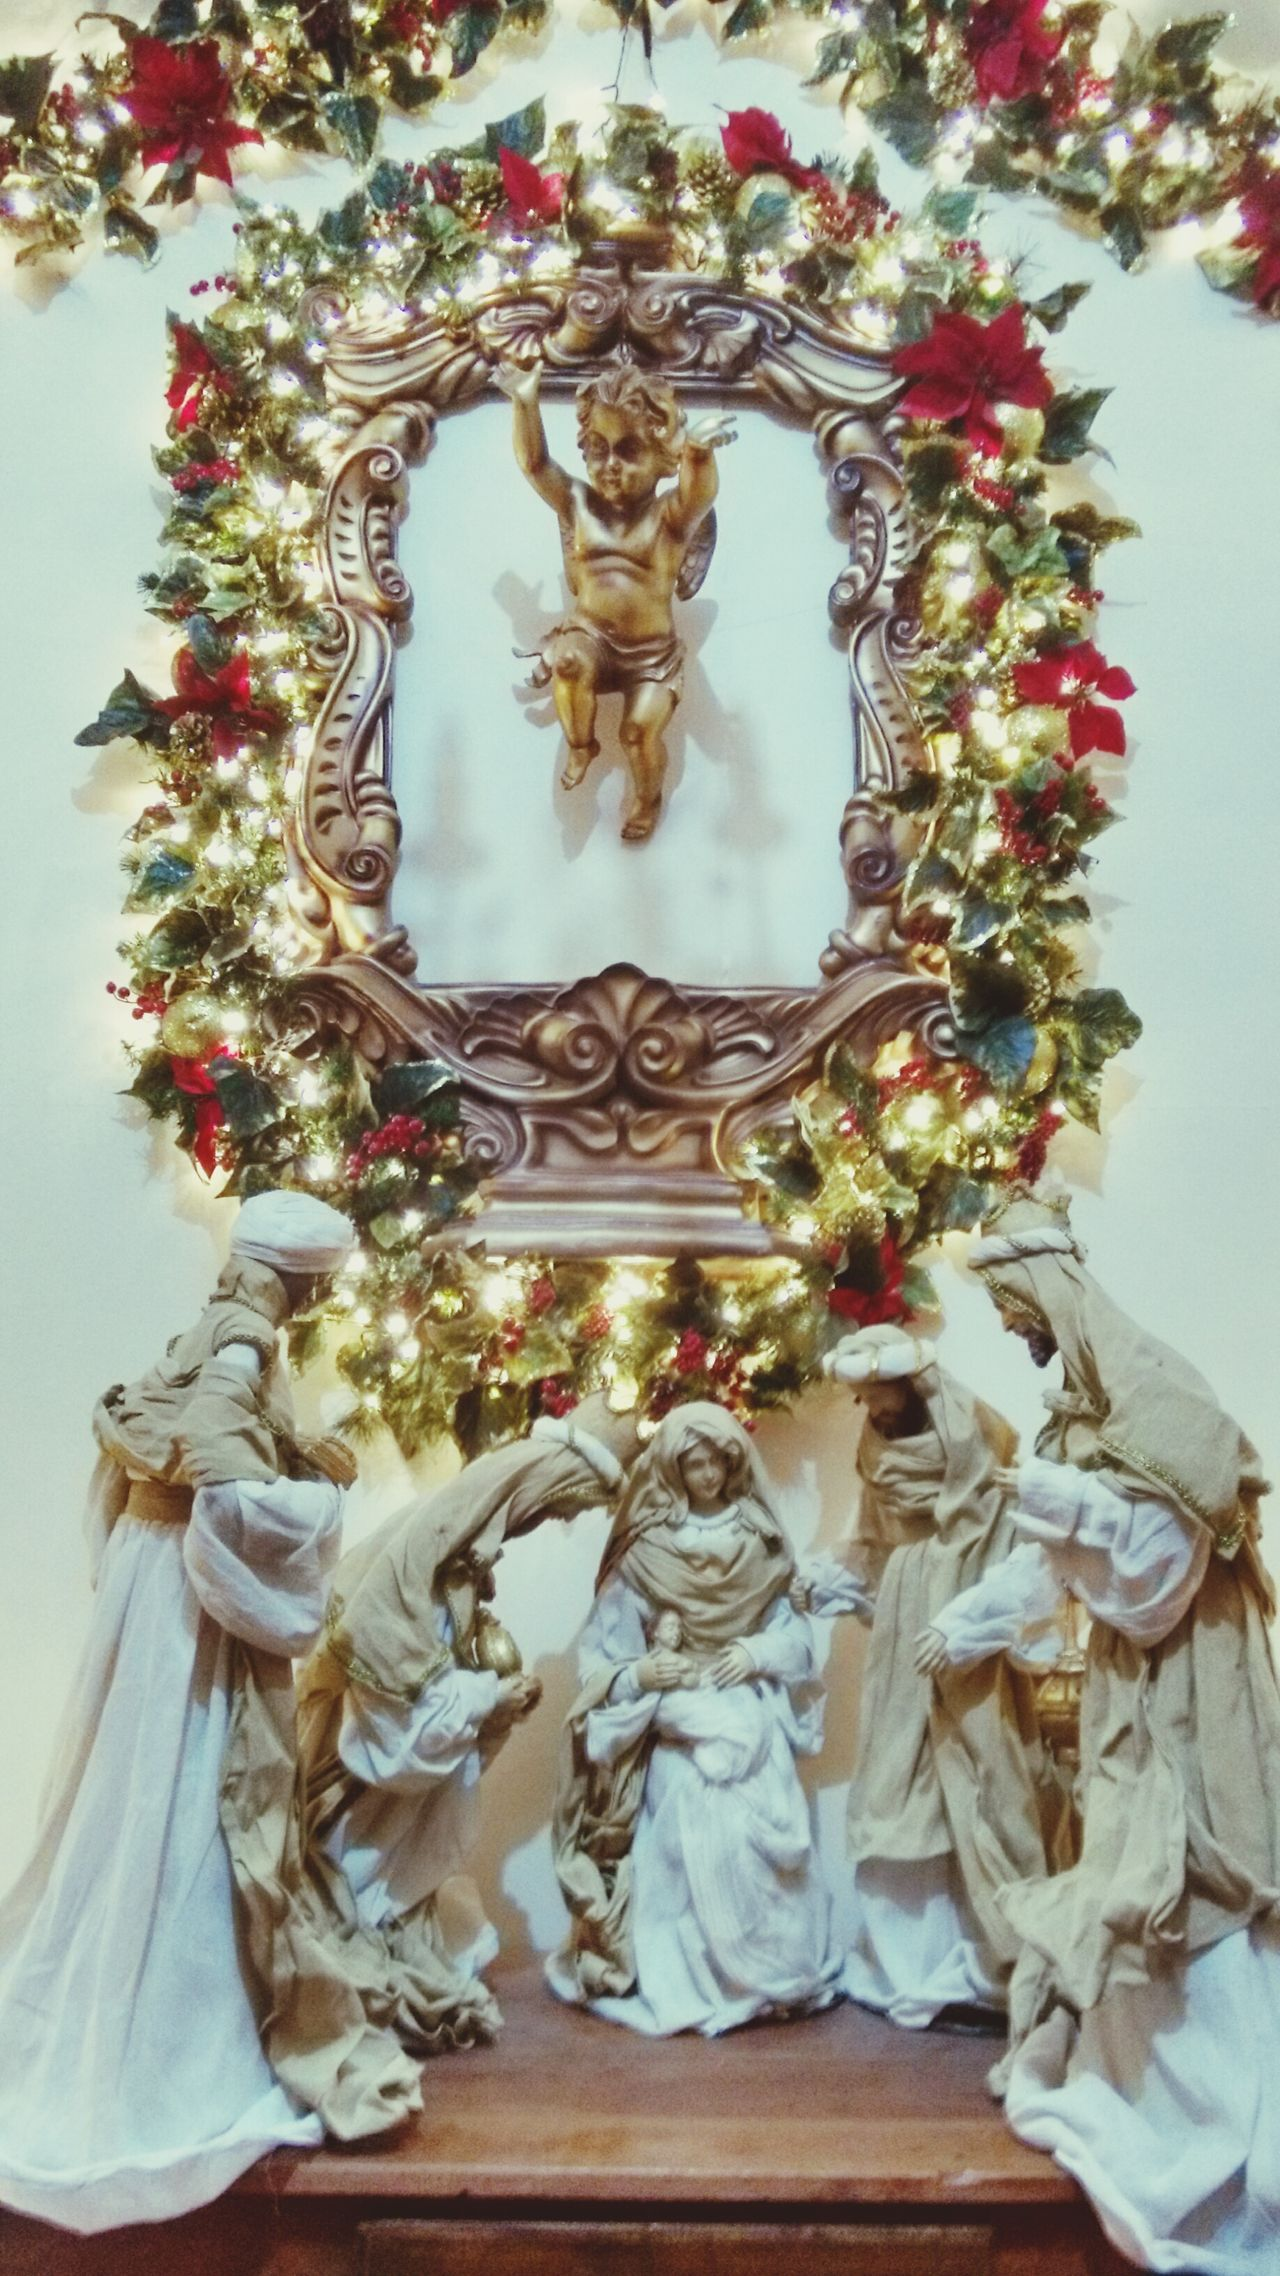 Mery Christmas Fimdeano Papainoel Maisamor Moreloveplease Endofyear Feliznatal Santaclaus Bahia/brazil Salvador